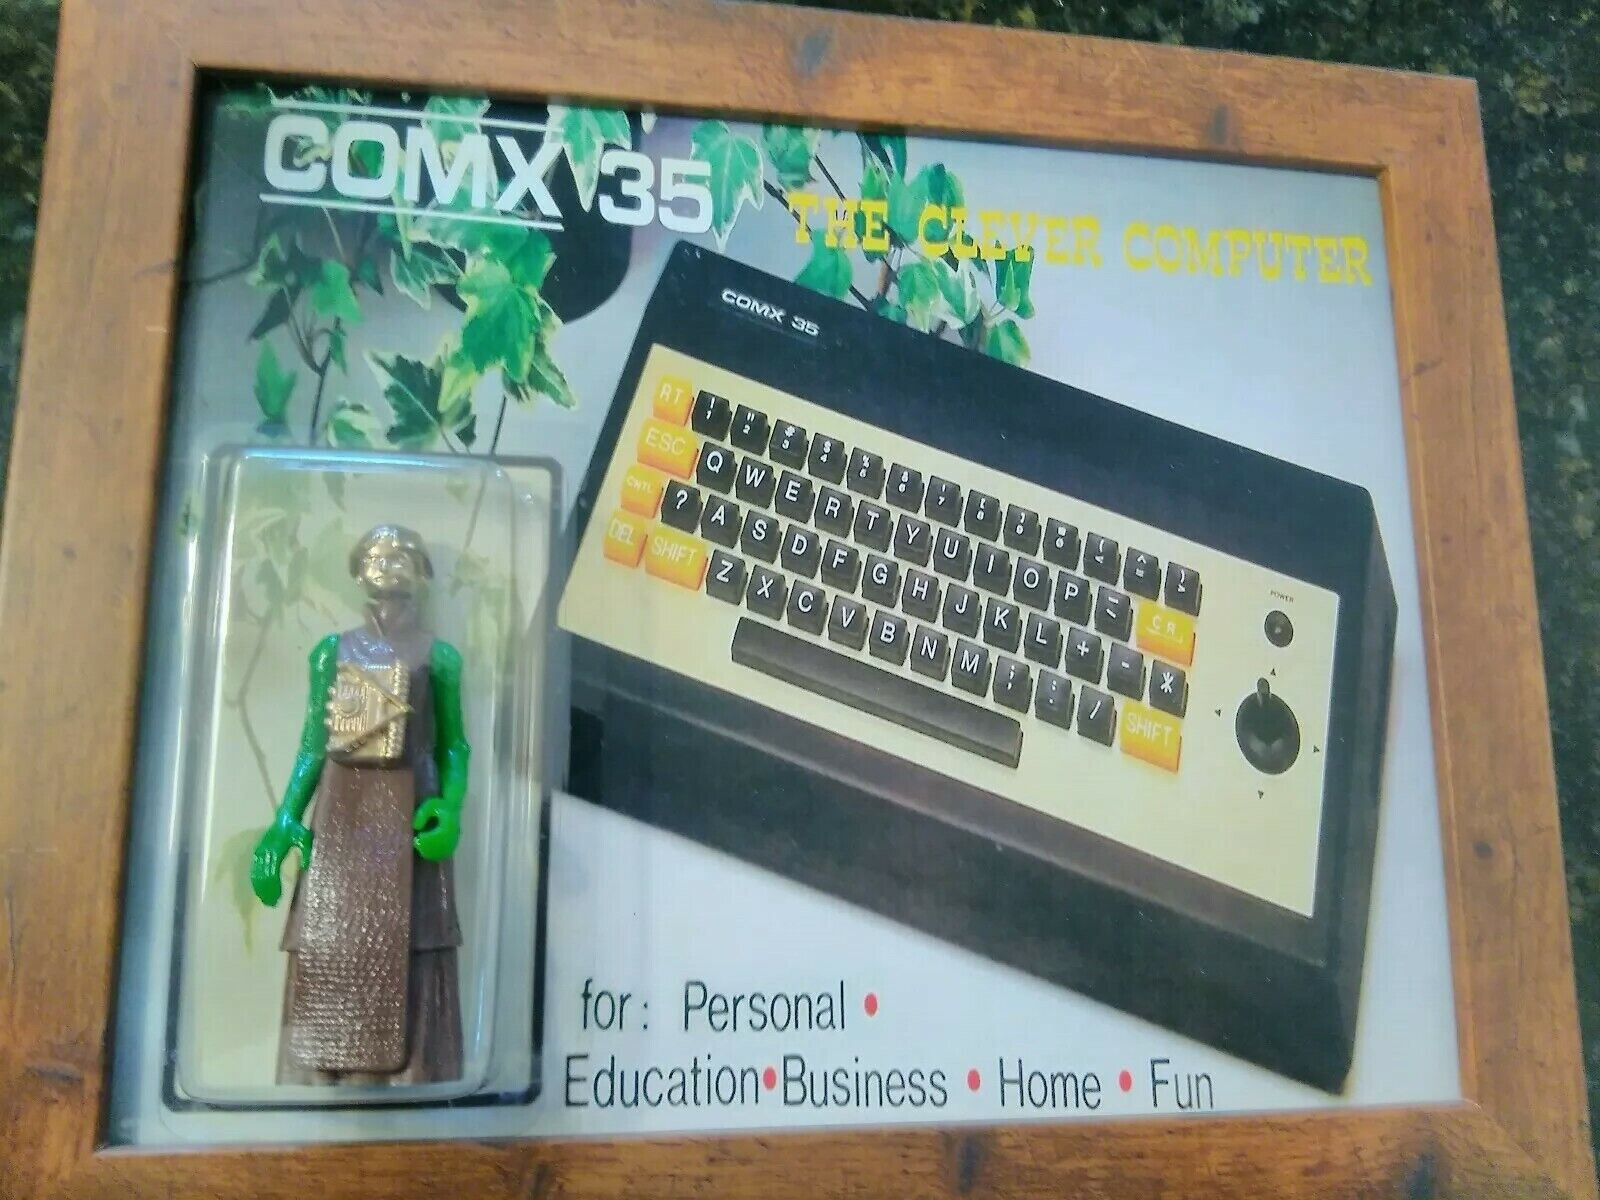 Estrella Wars Trek Sucklord Comx 35 Inteligente Pc Apple MAC suckadelic DKE G.i. Joe